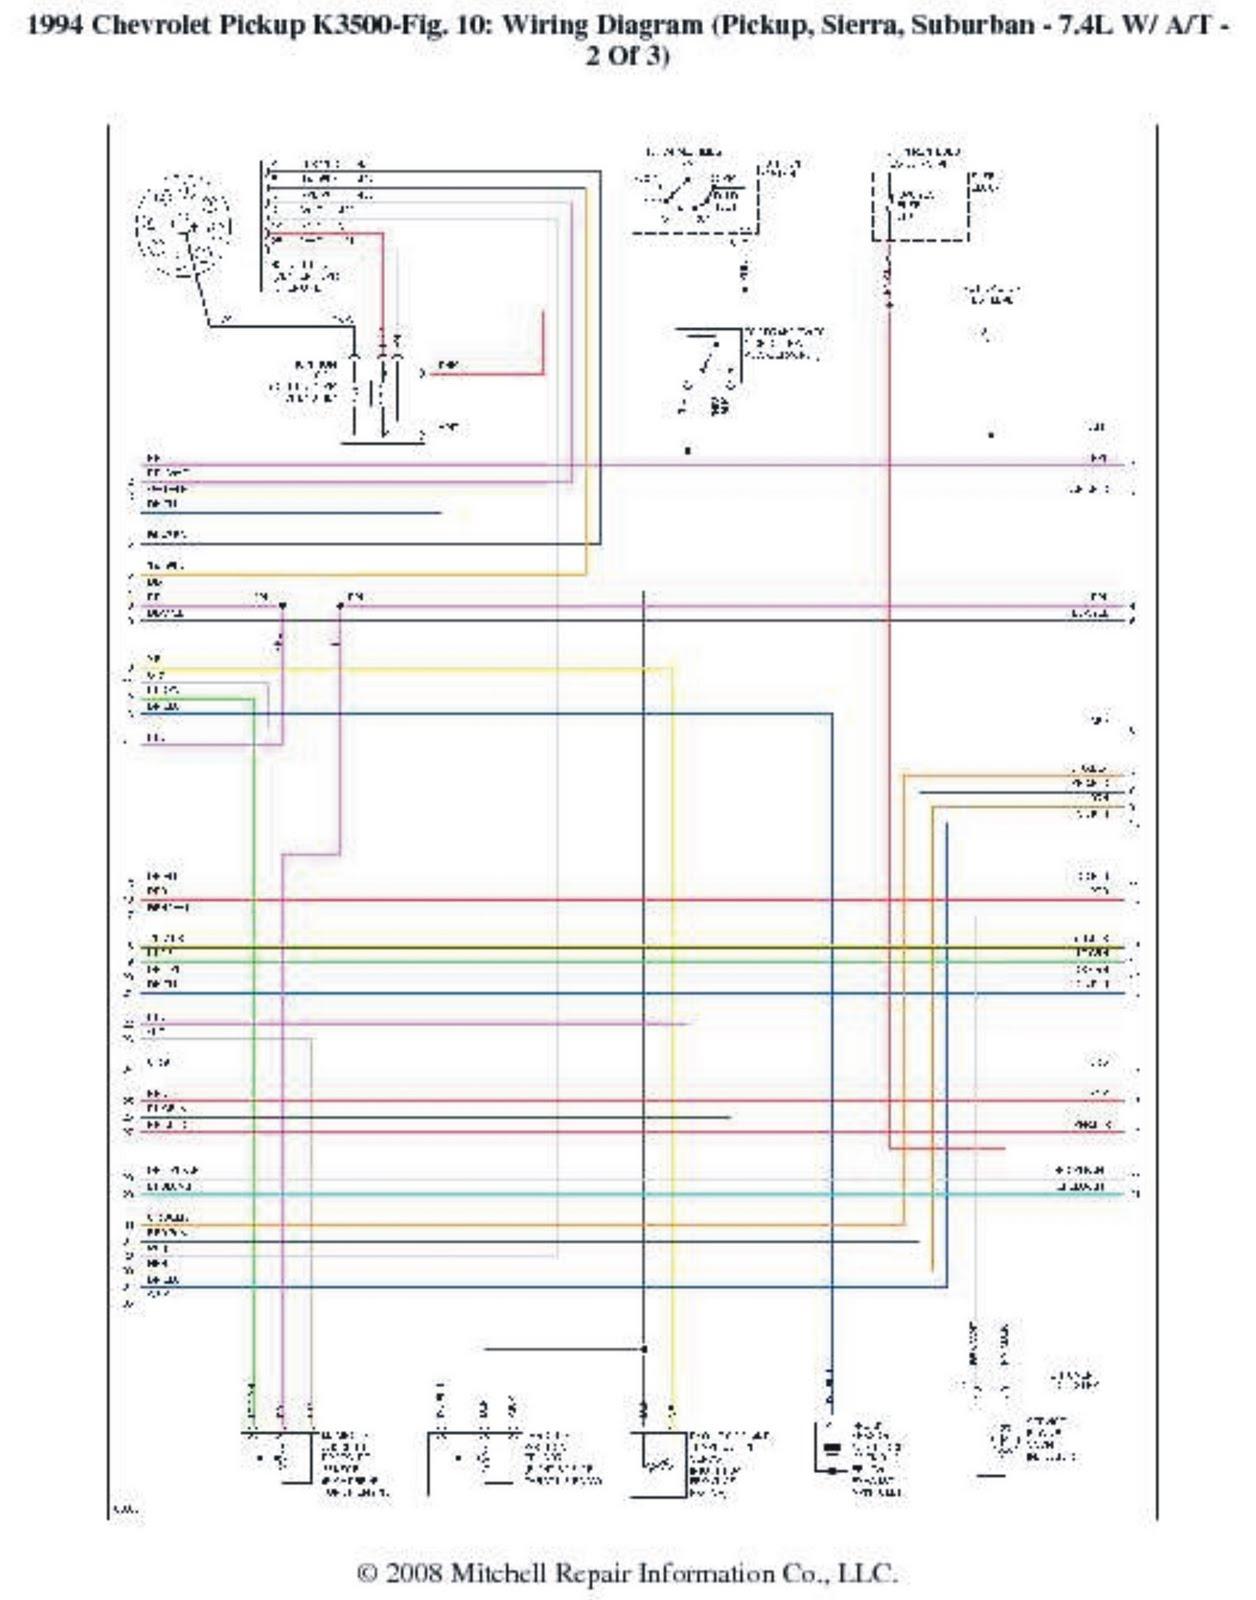 92 Chevy Trailer Wiring Diagramtrailerwiring Diagram Database 1994 Pickup Chevrolet Pick Up K3500resize Silverado Radio 1500 Wire Simple Electric Circuit 95ae74d7e72bd7da55ad3ebf1de28c64